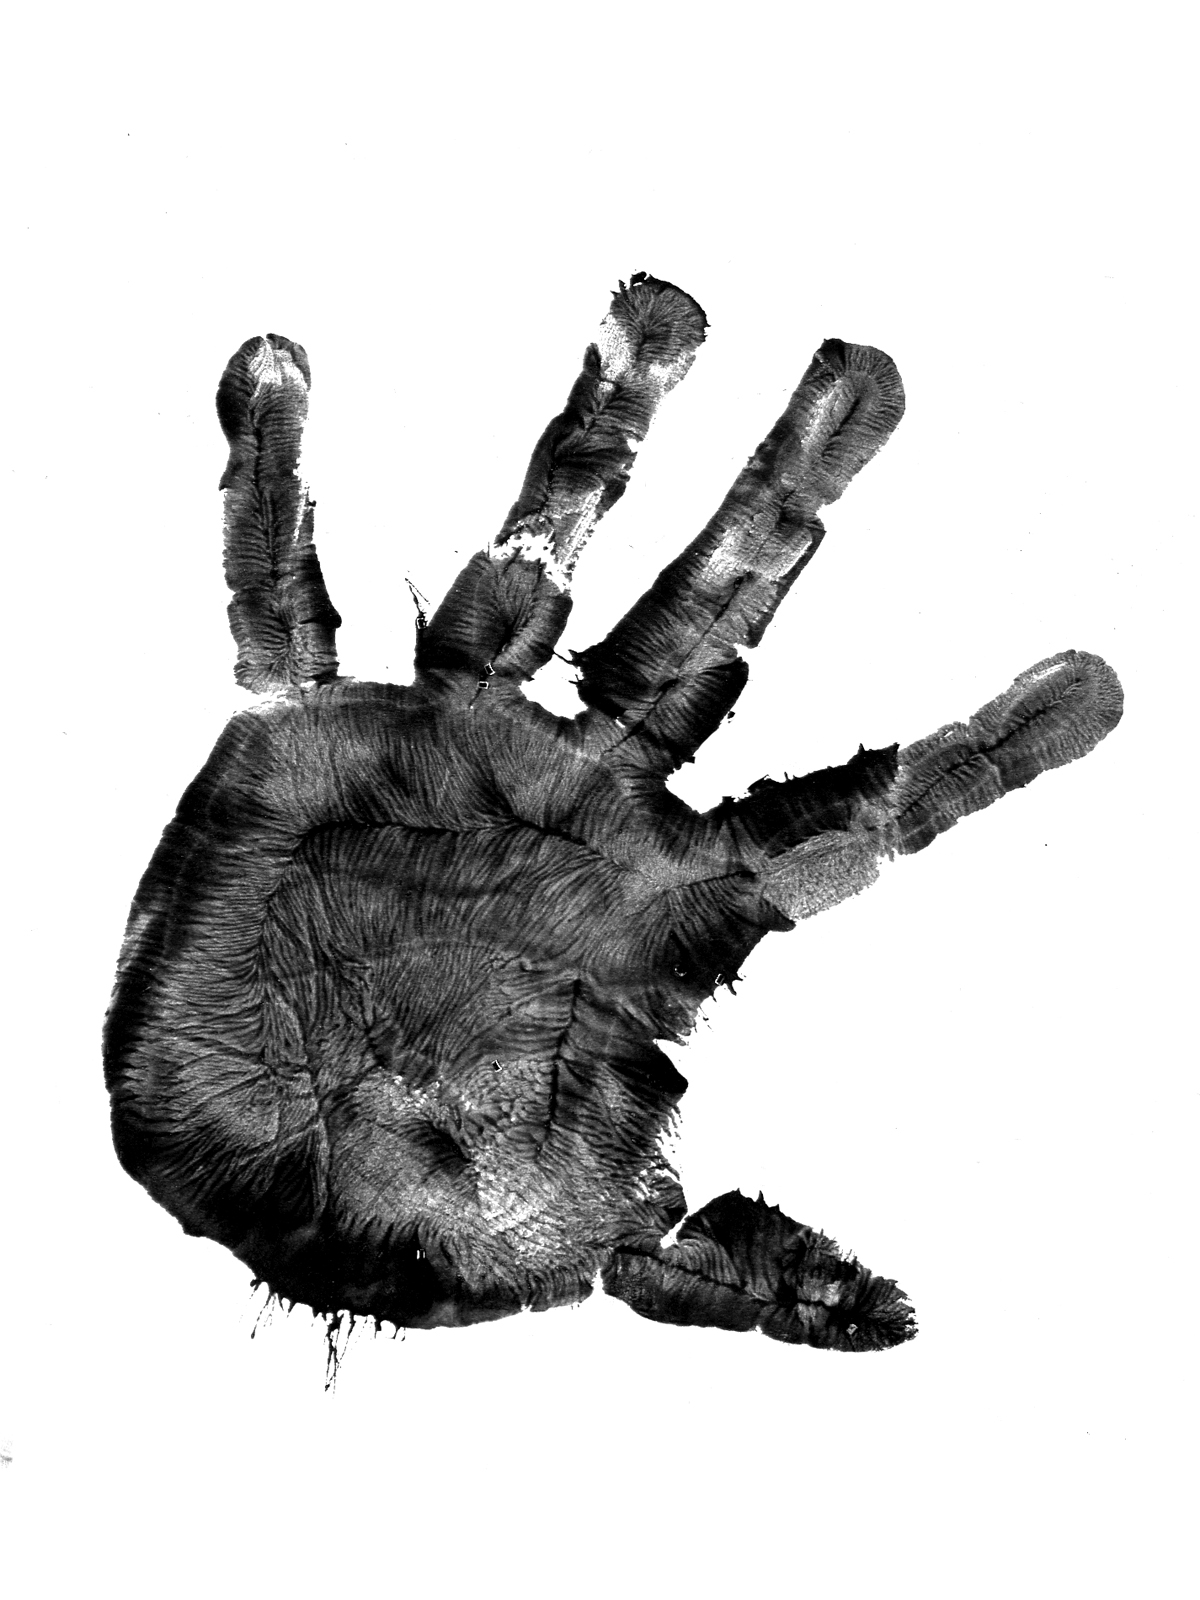 image after image handprint paint fingerprint print finger print